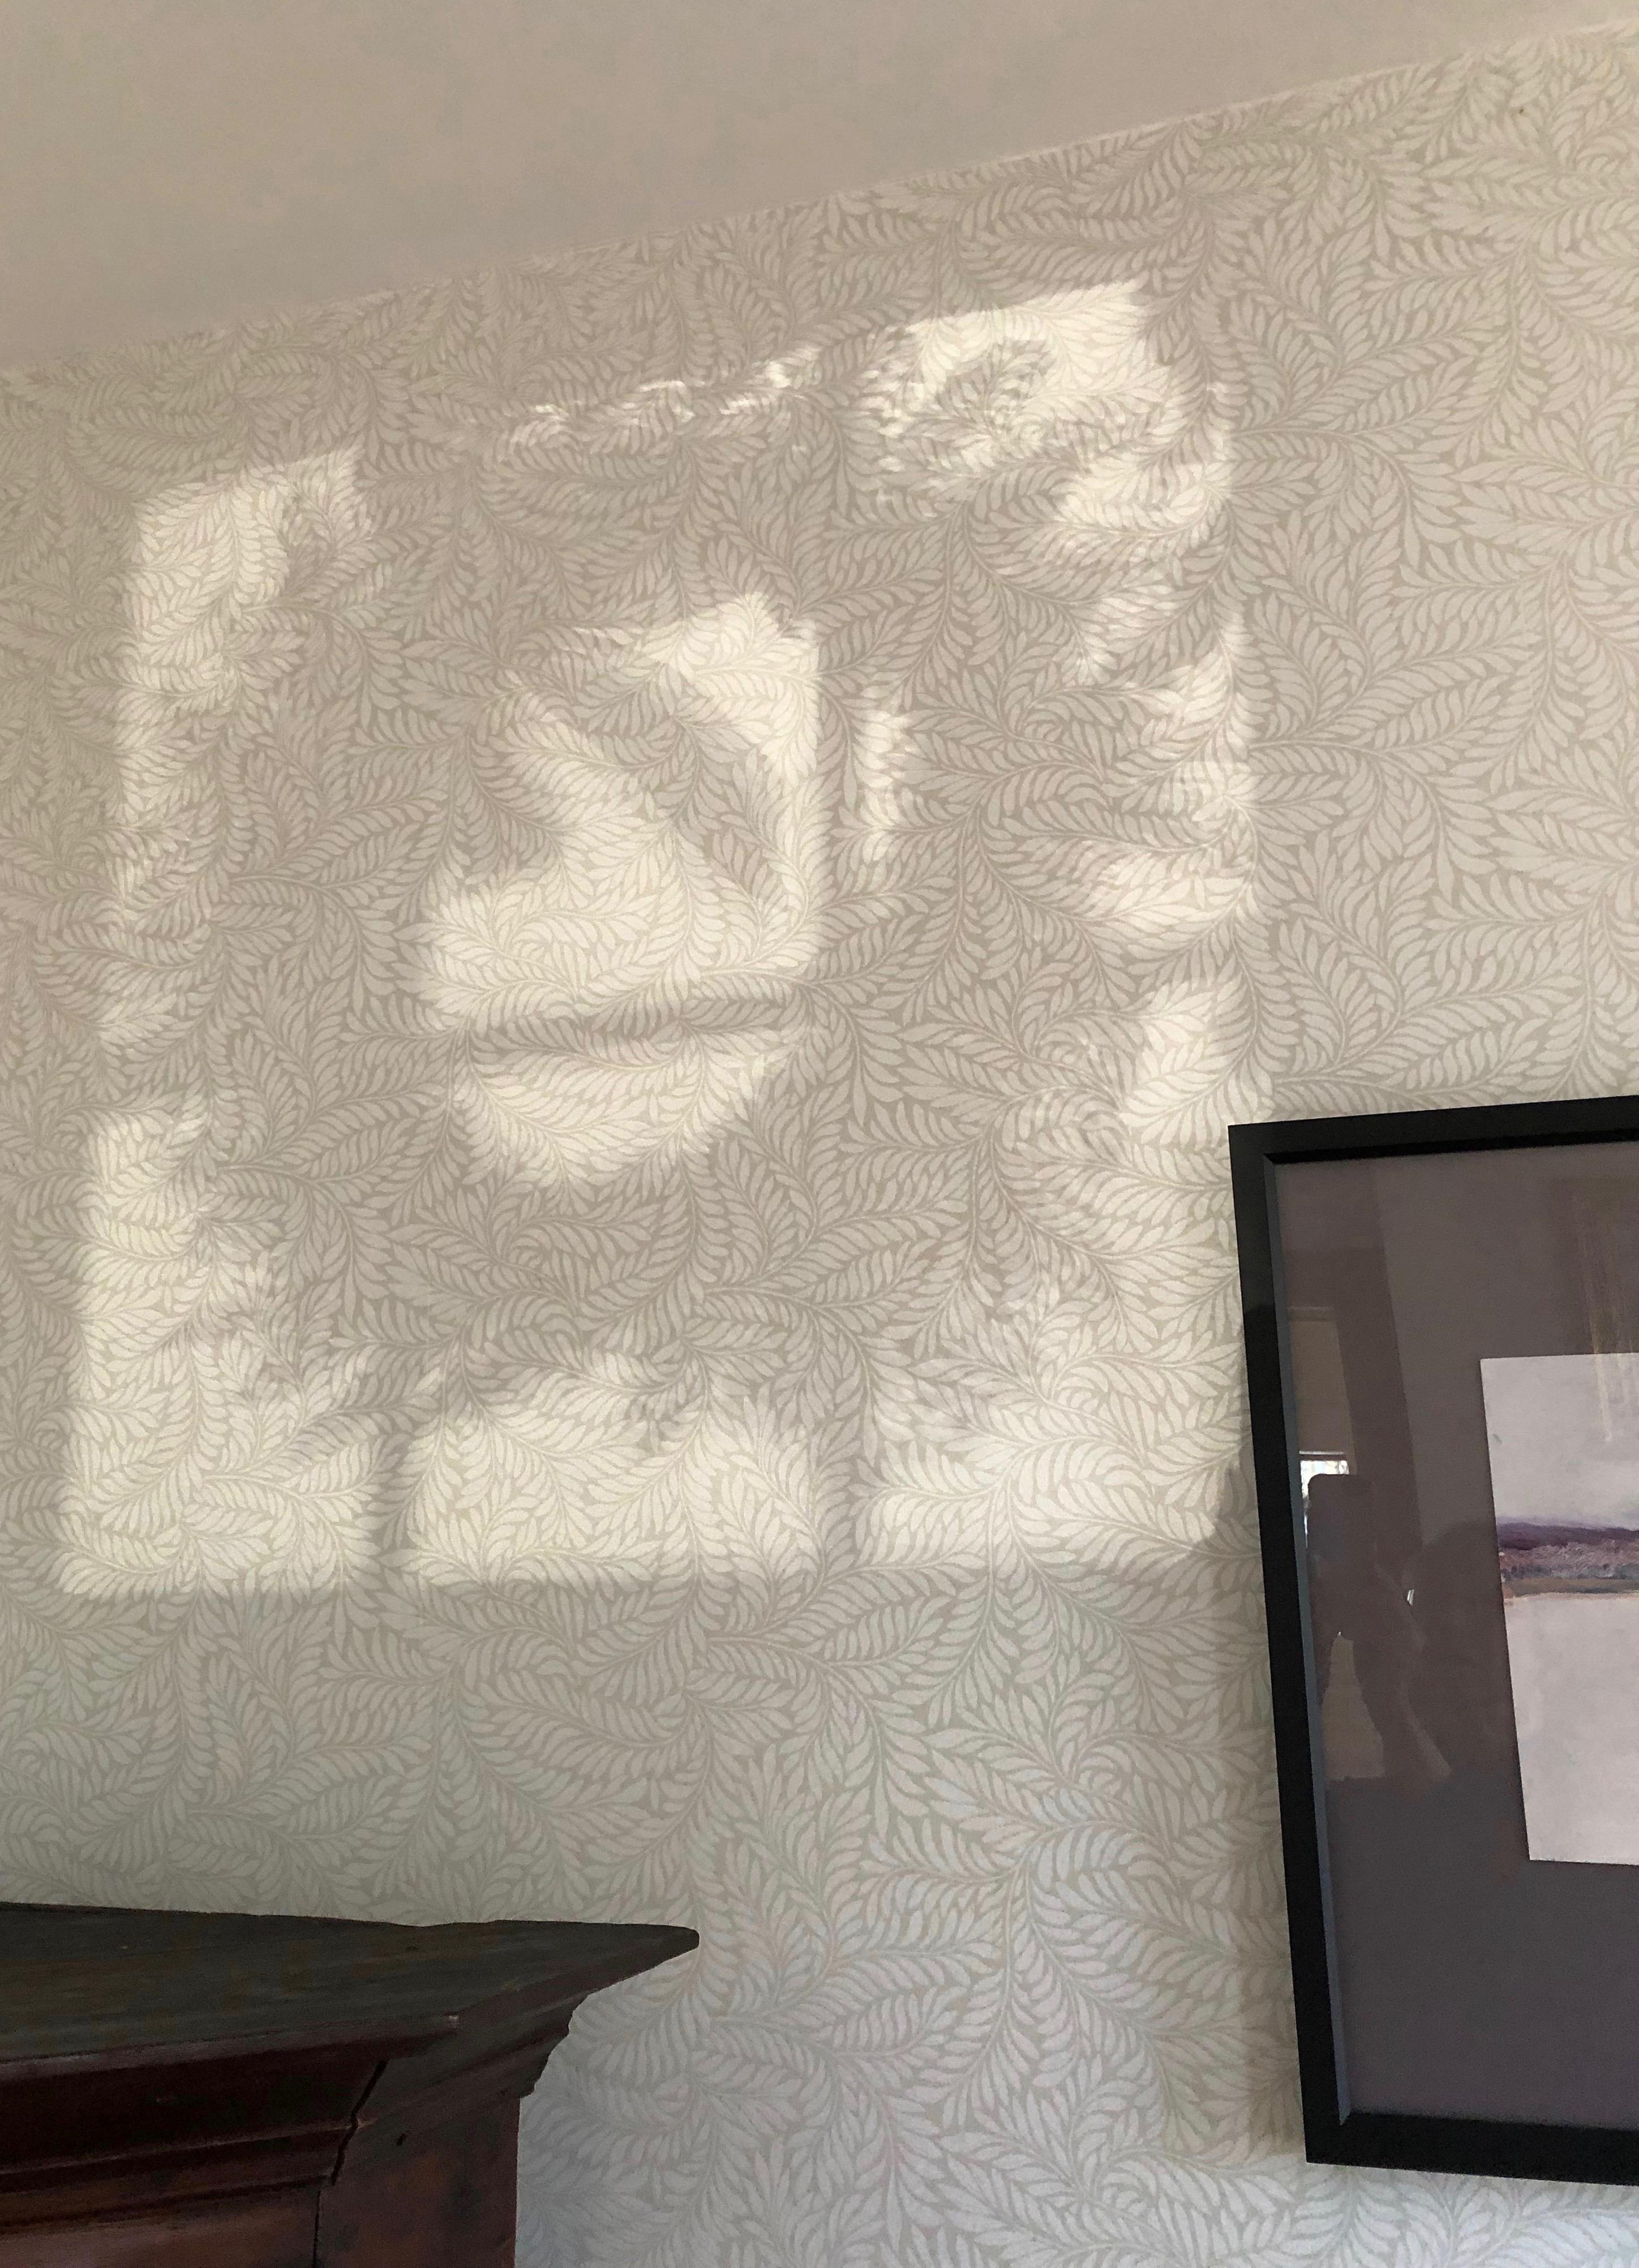 120718-shadow-of-Xmas-wreath